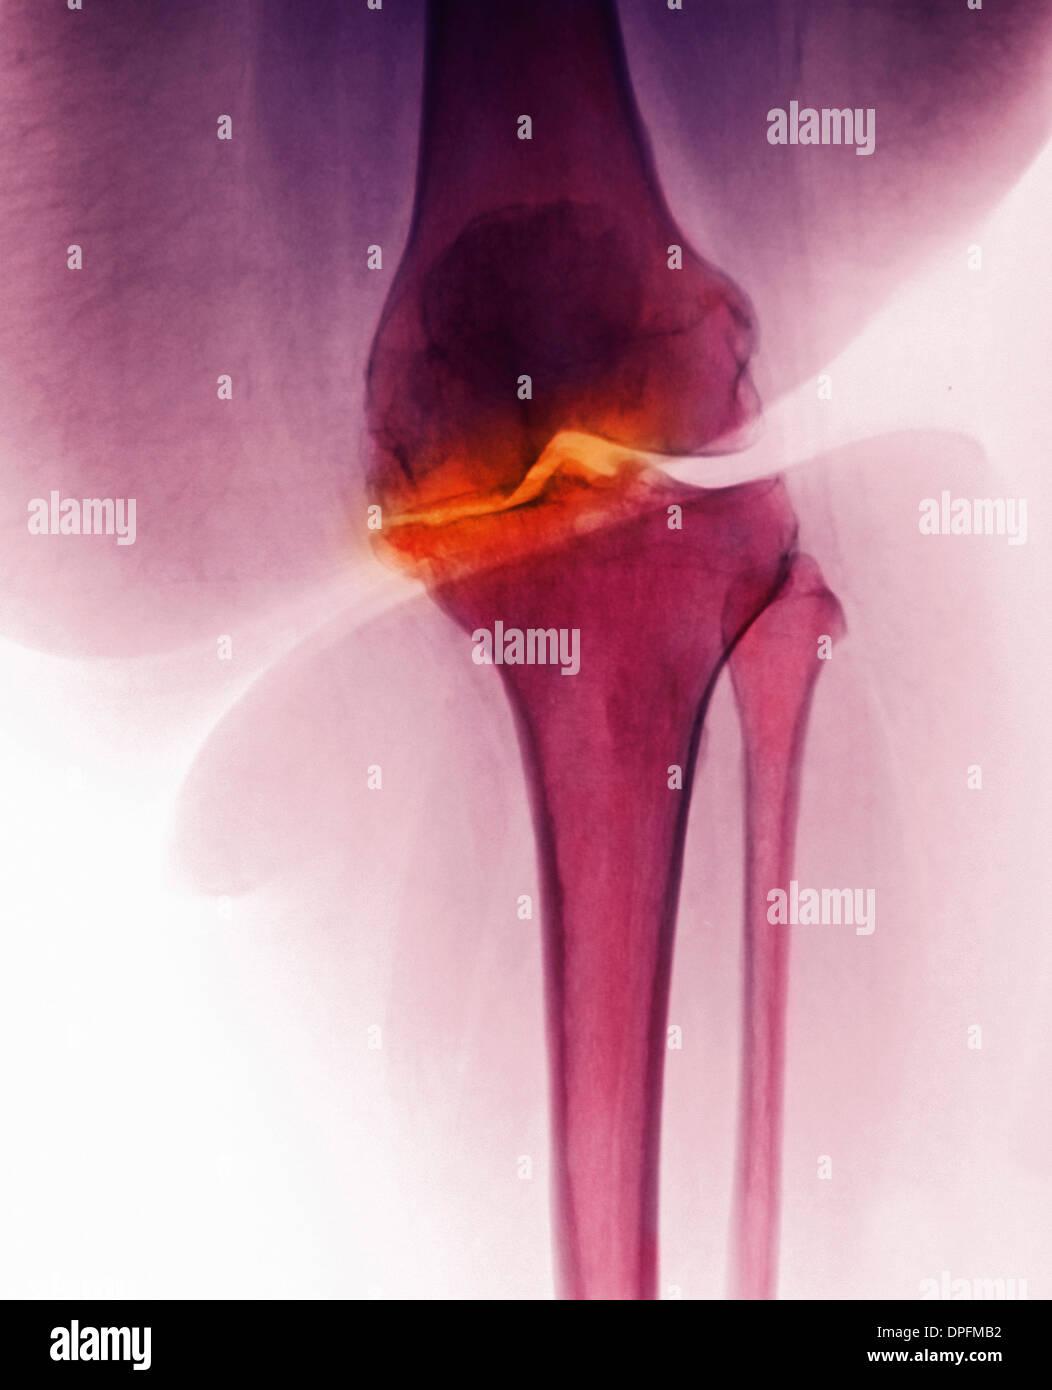 Röntgen des Knies mit Arthrose Stockbild